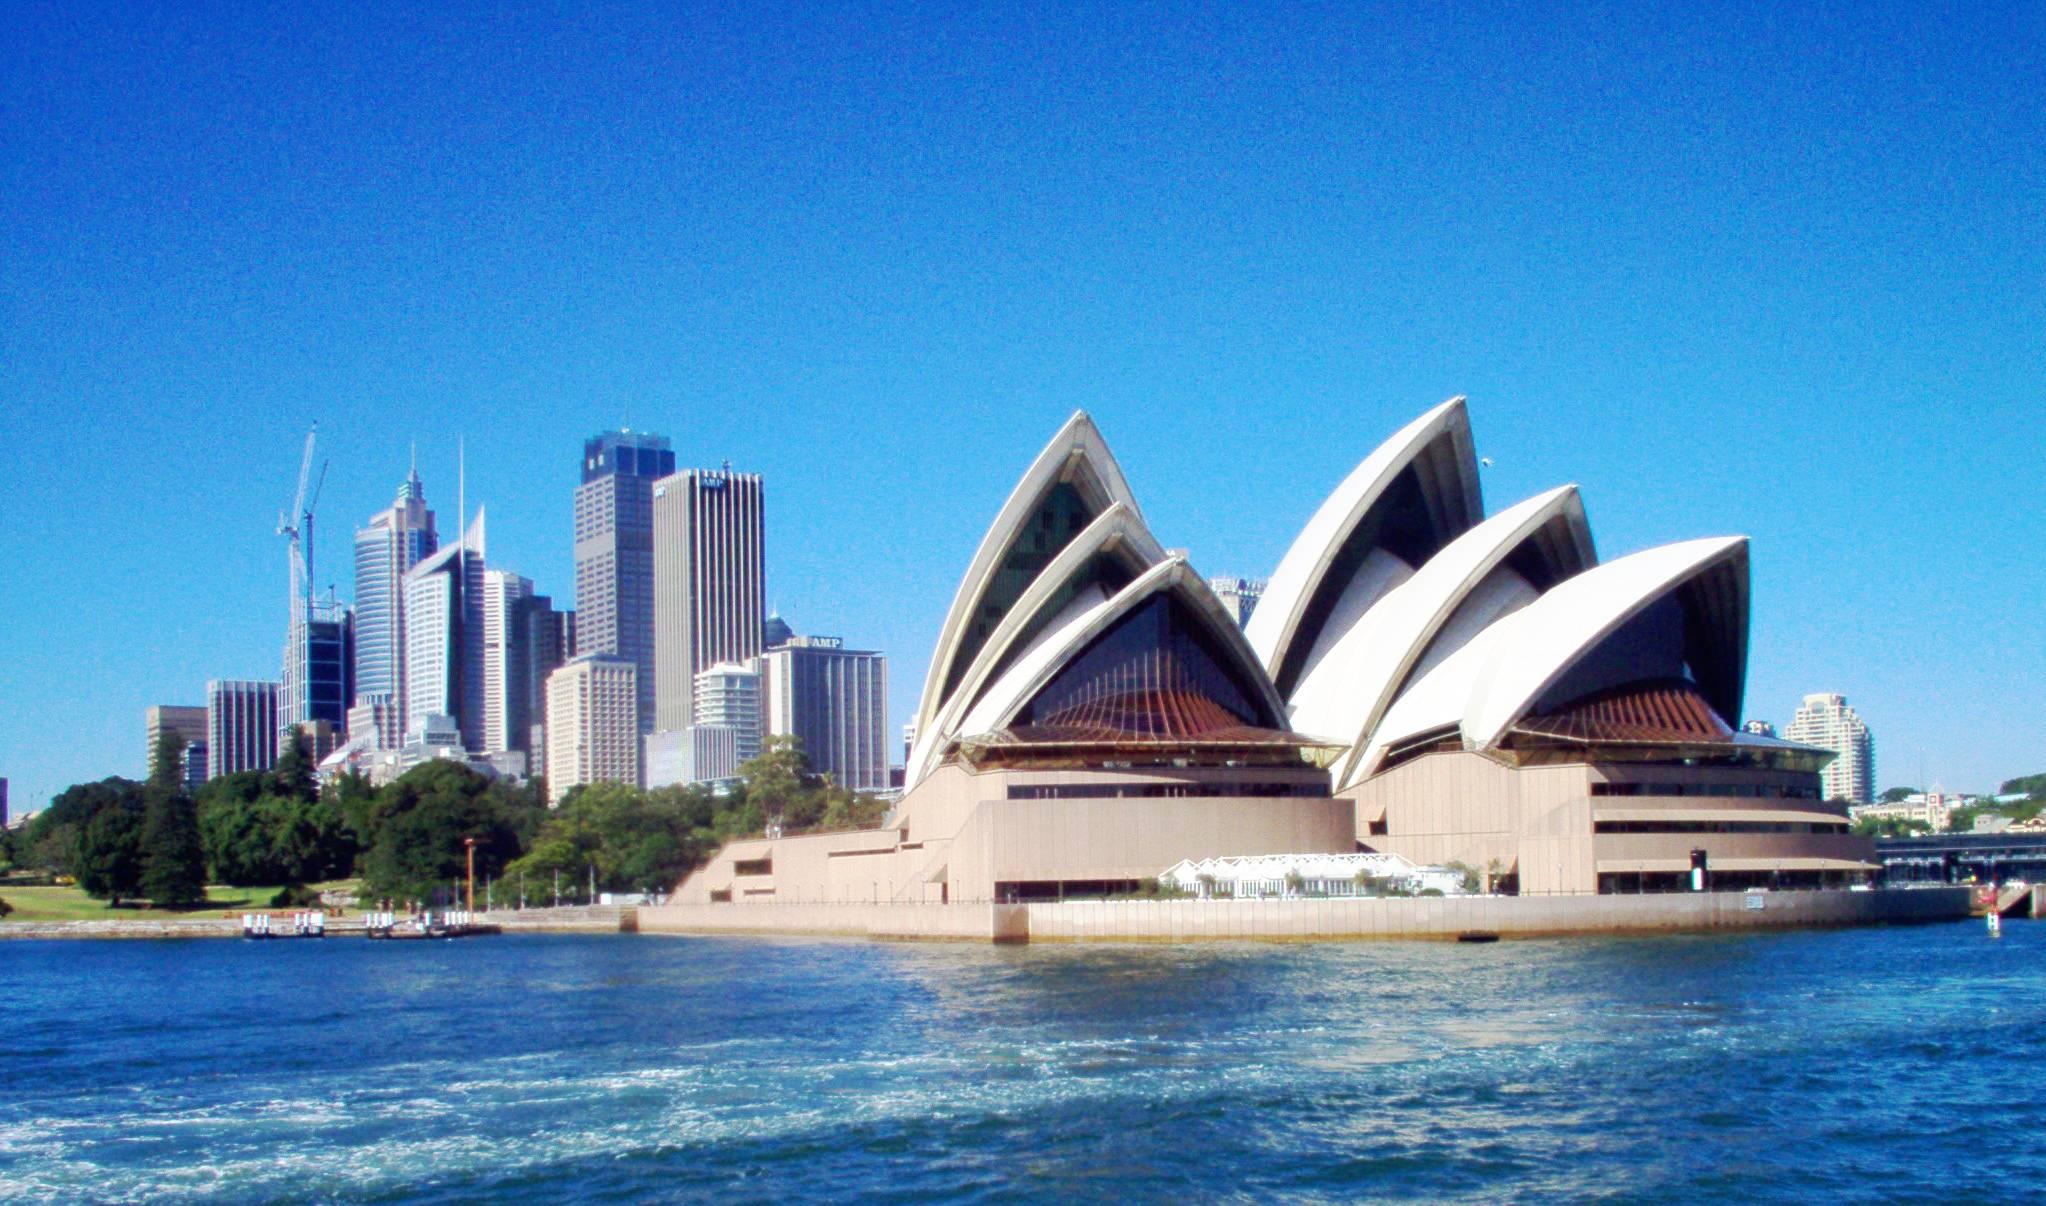 Sydney Opera House Wallpapers 2046x1206